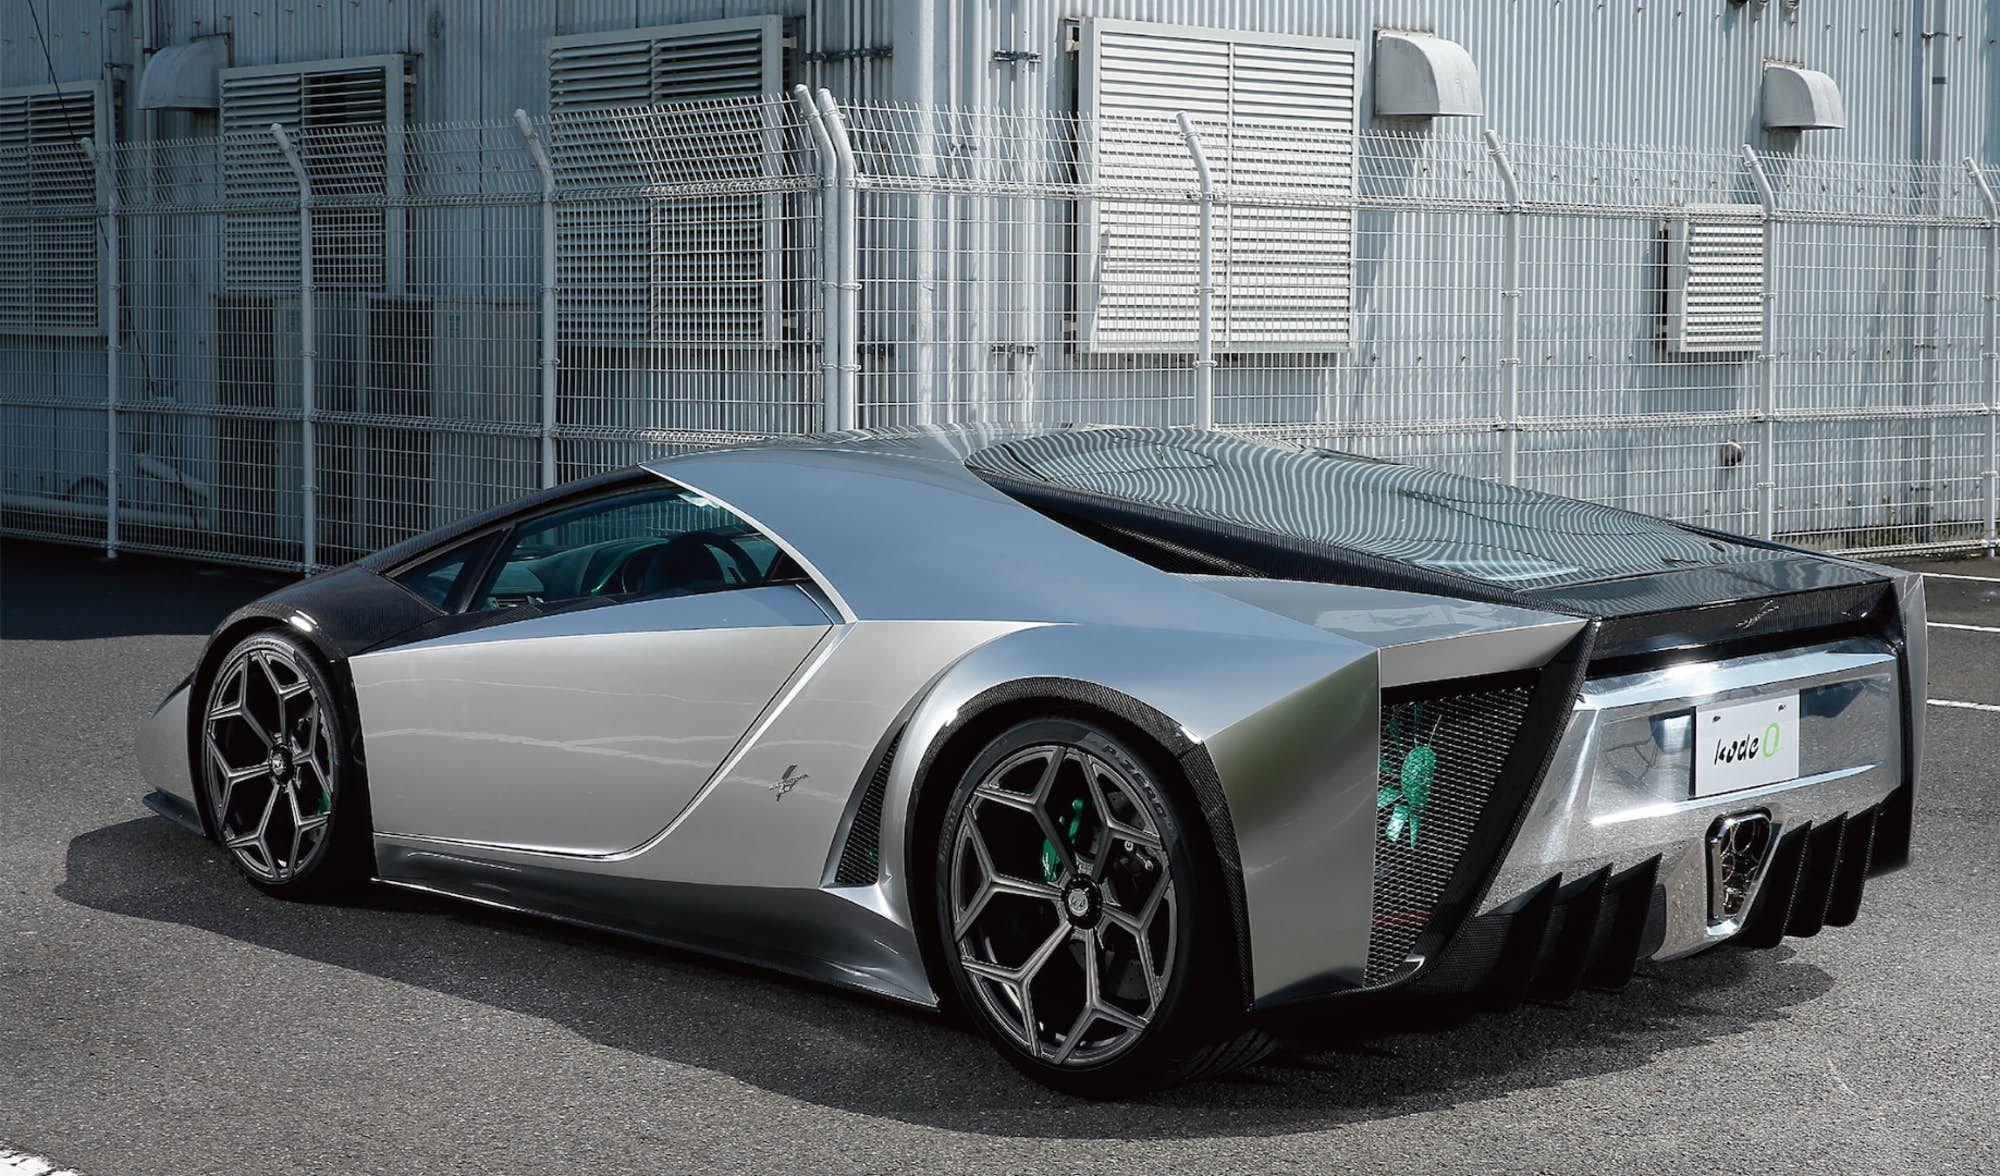 Wedge Shaped Ken Okuyama Creation Channels 70s Supercar Style Super Cars Design Futuristic Cars